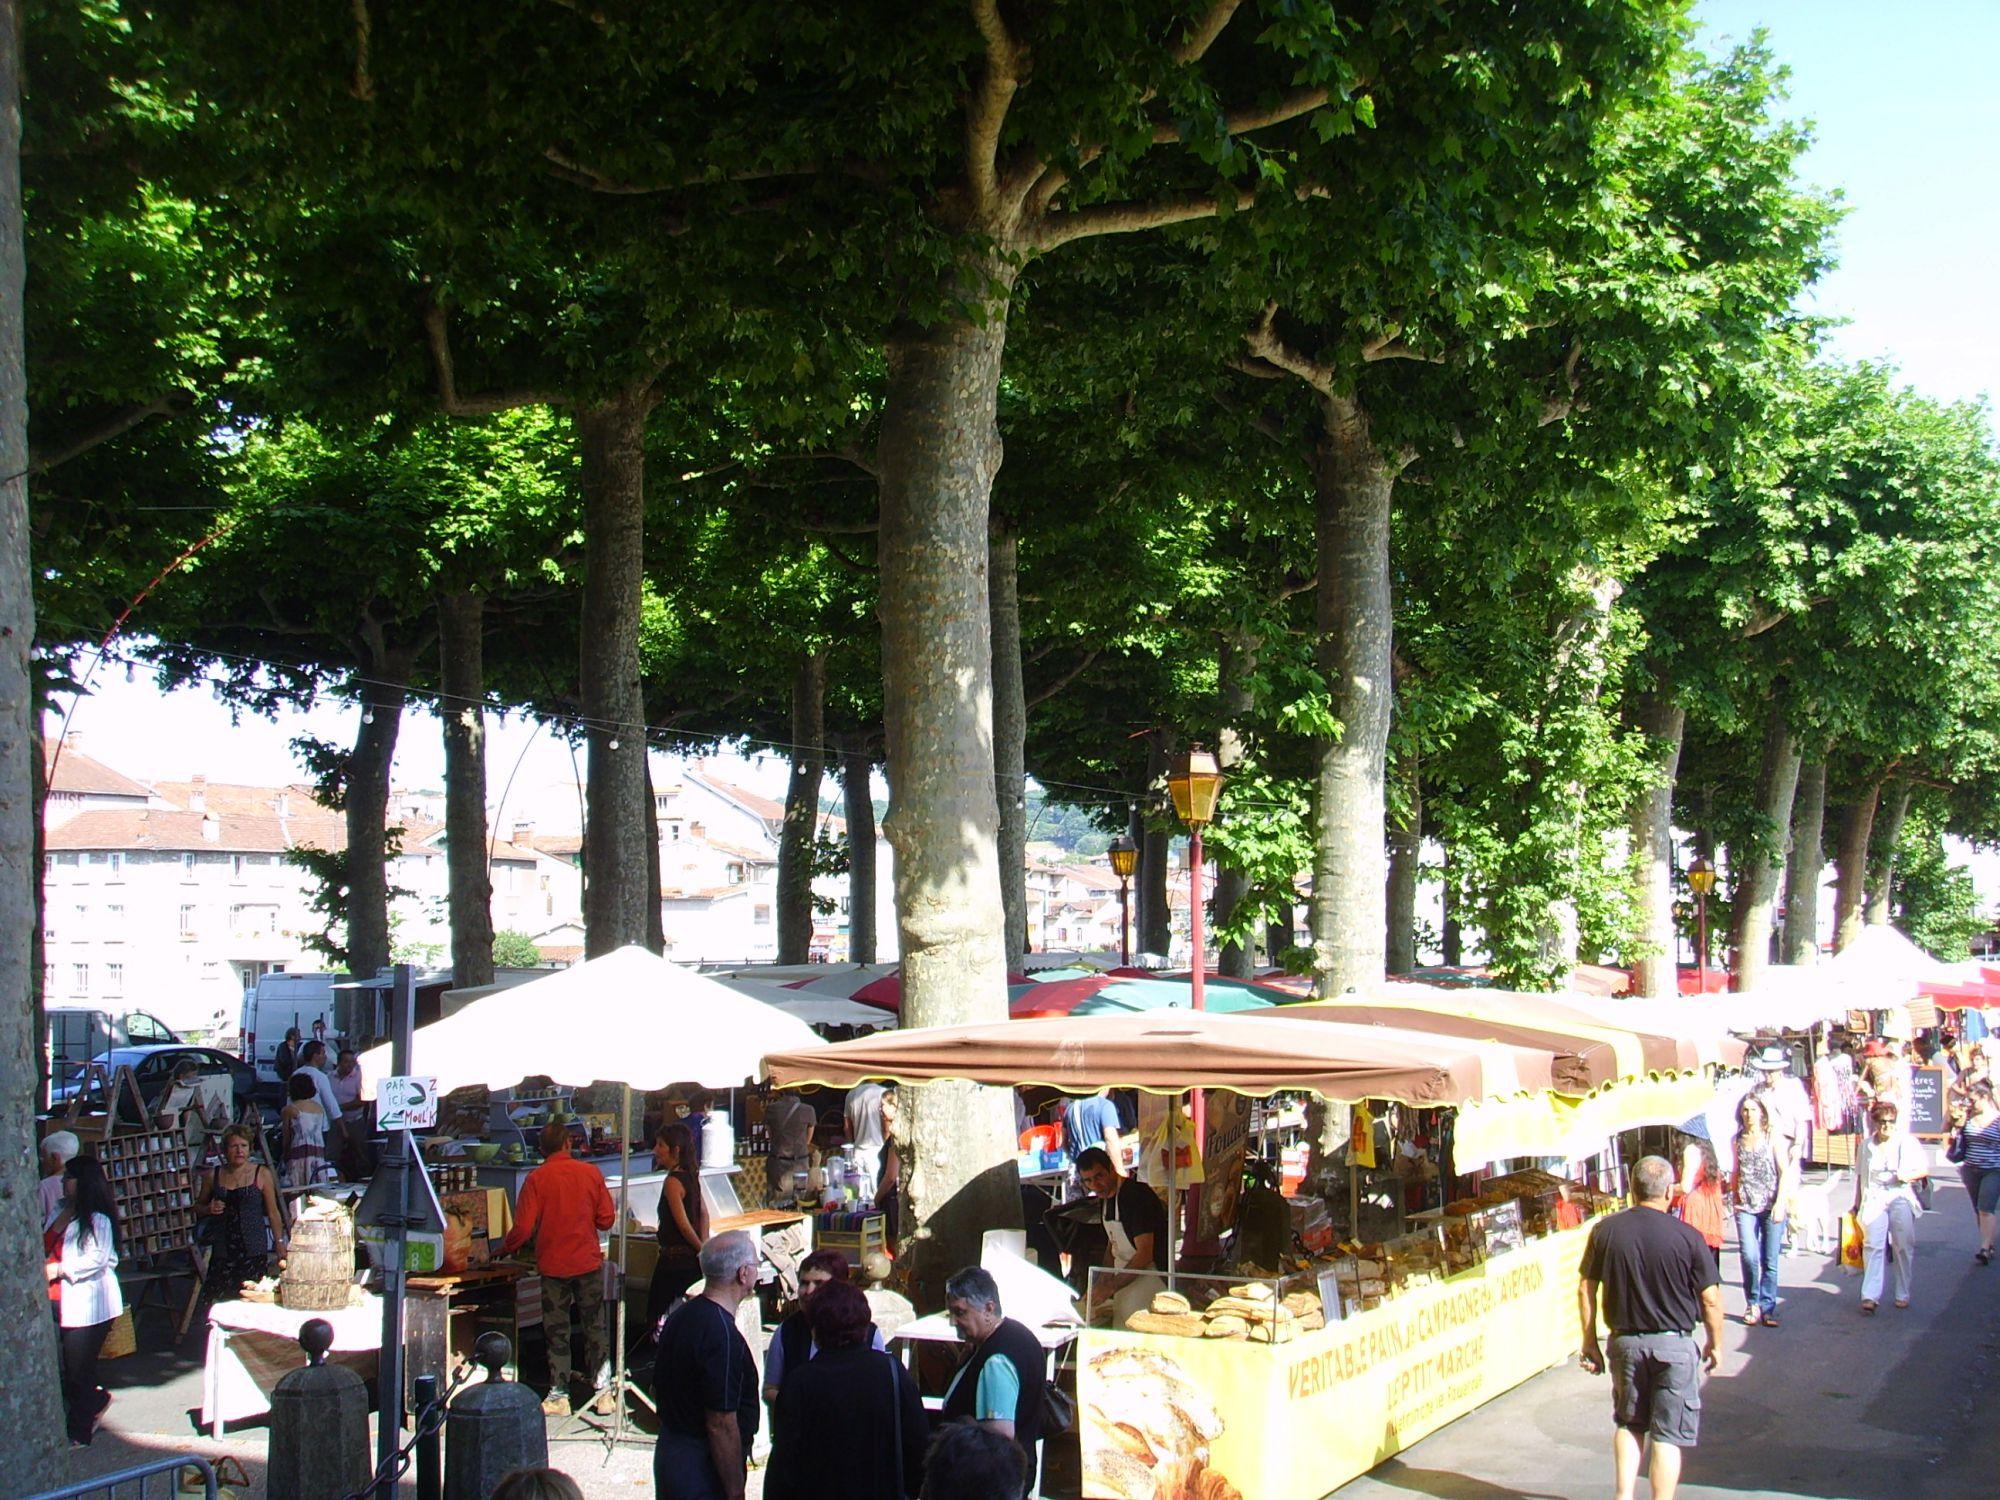 Marché de Saint-Girons le samedi matin